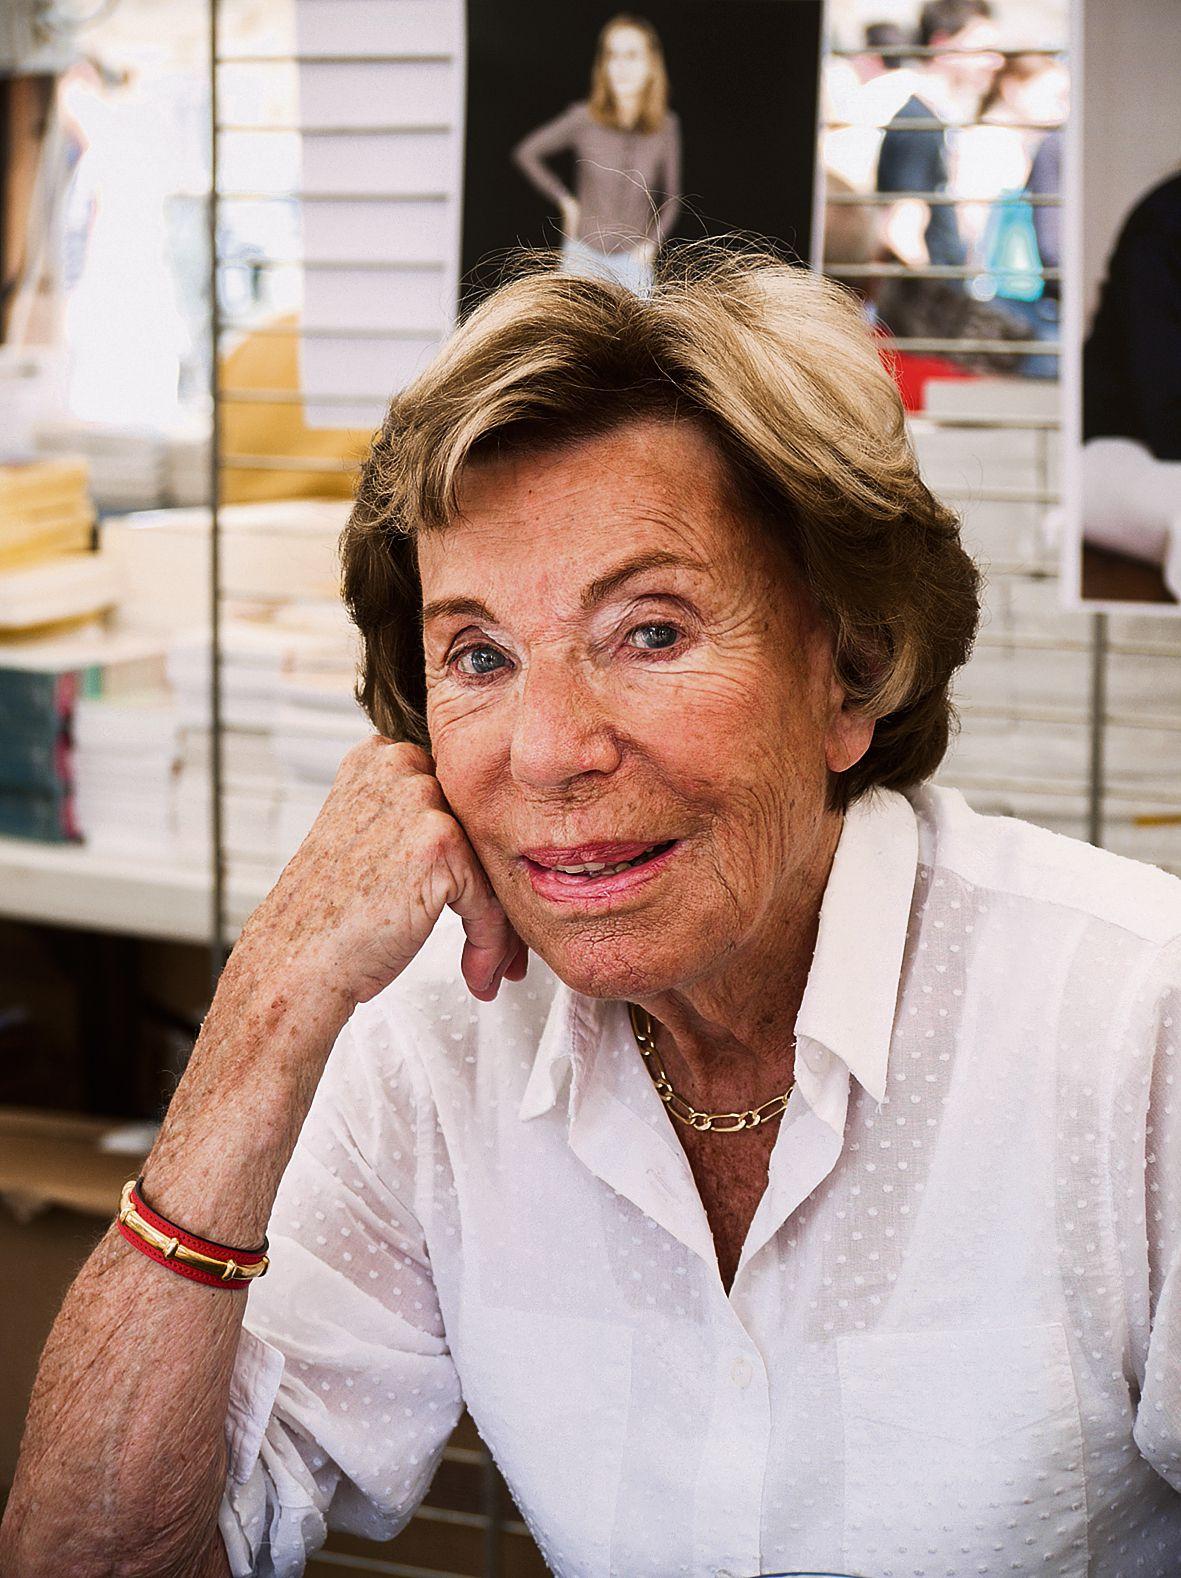 Benoîte Groult in 2010 Foto Wikimedia commons